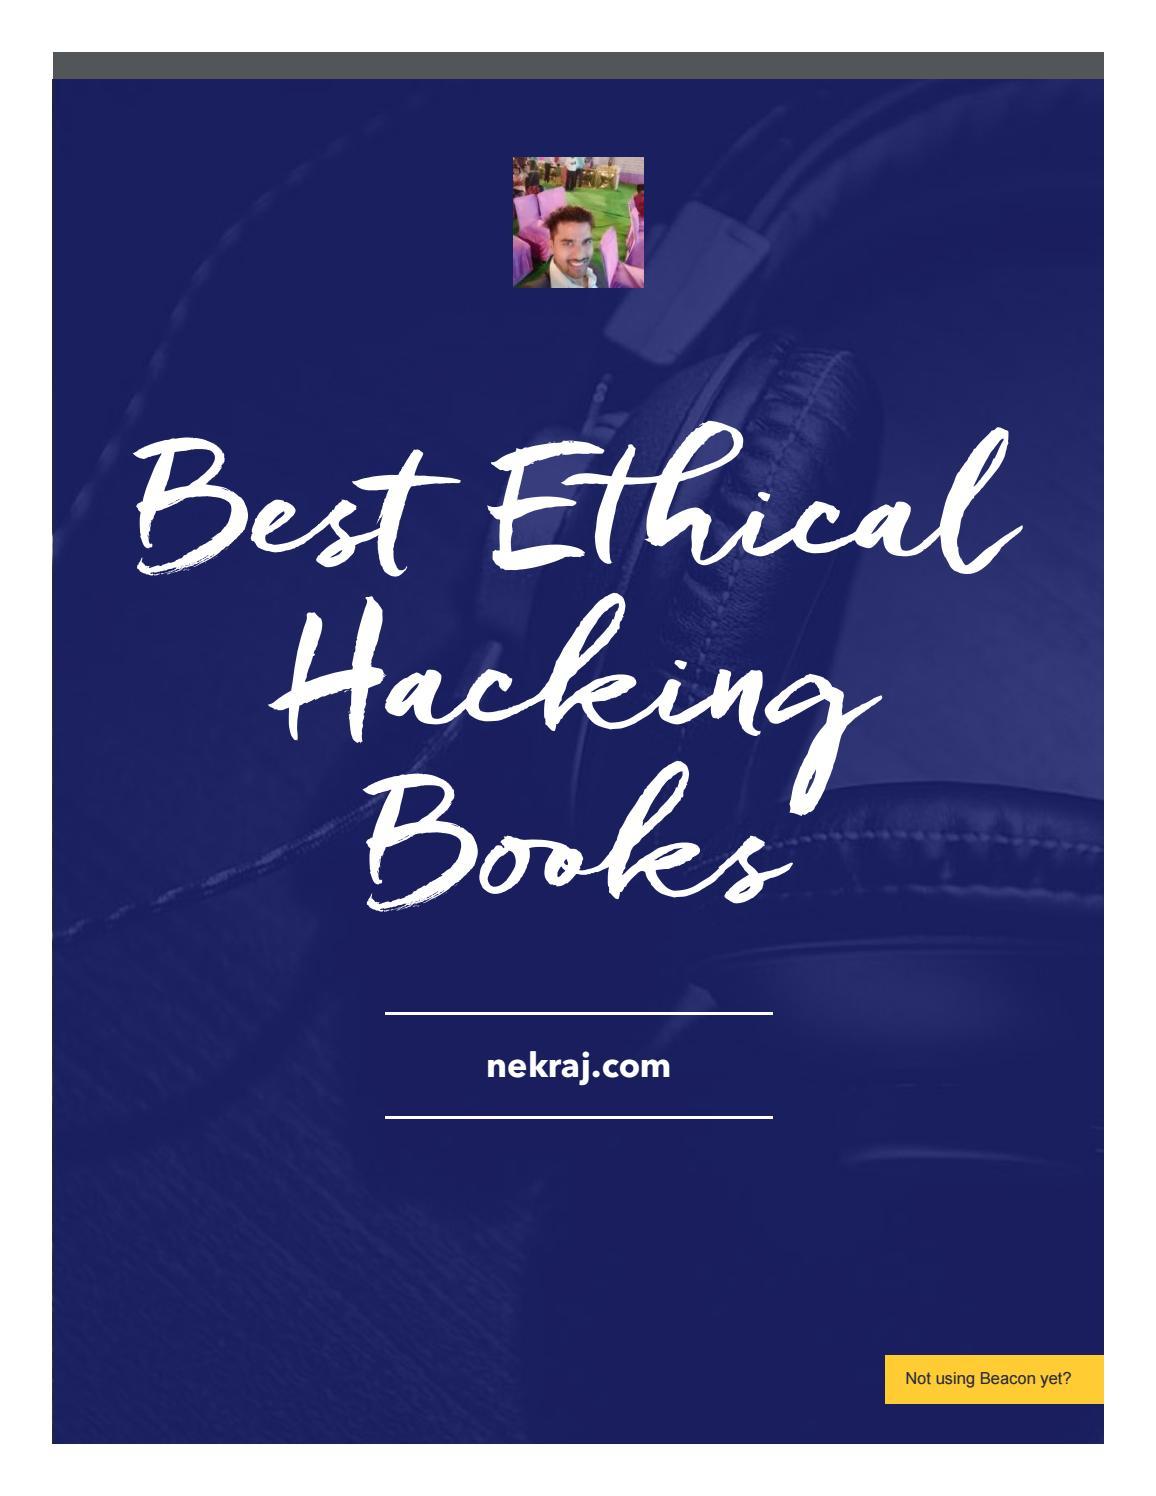 Download 501 Free Best Ethical Hacking Books In 2020 Pdf Version By Nekraj Bhartiya Issuu